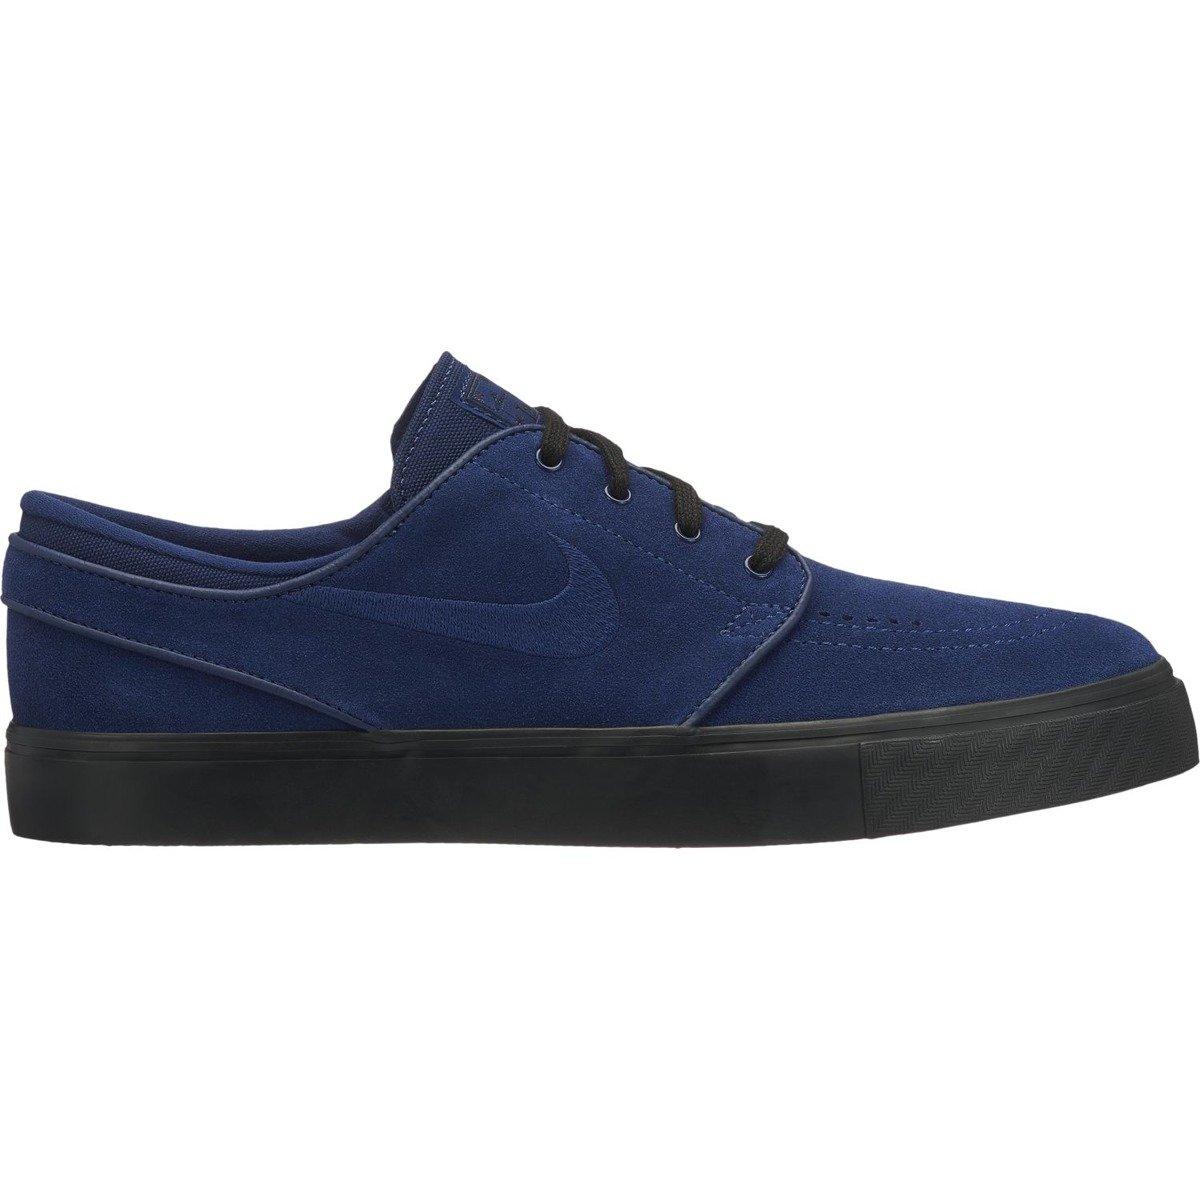 Miniramp SkateGeschäft buty nike sb zoom stefan janoski janoski stefan Blau VOID/Blau b8eafc